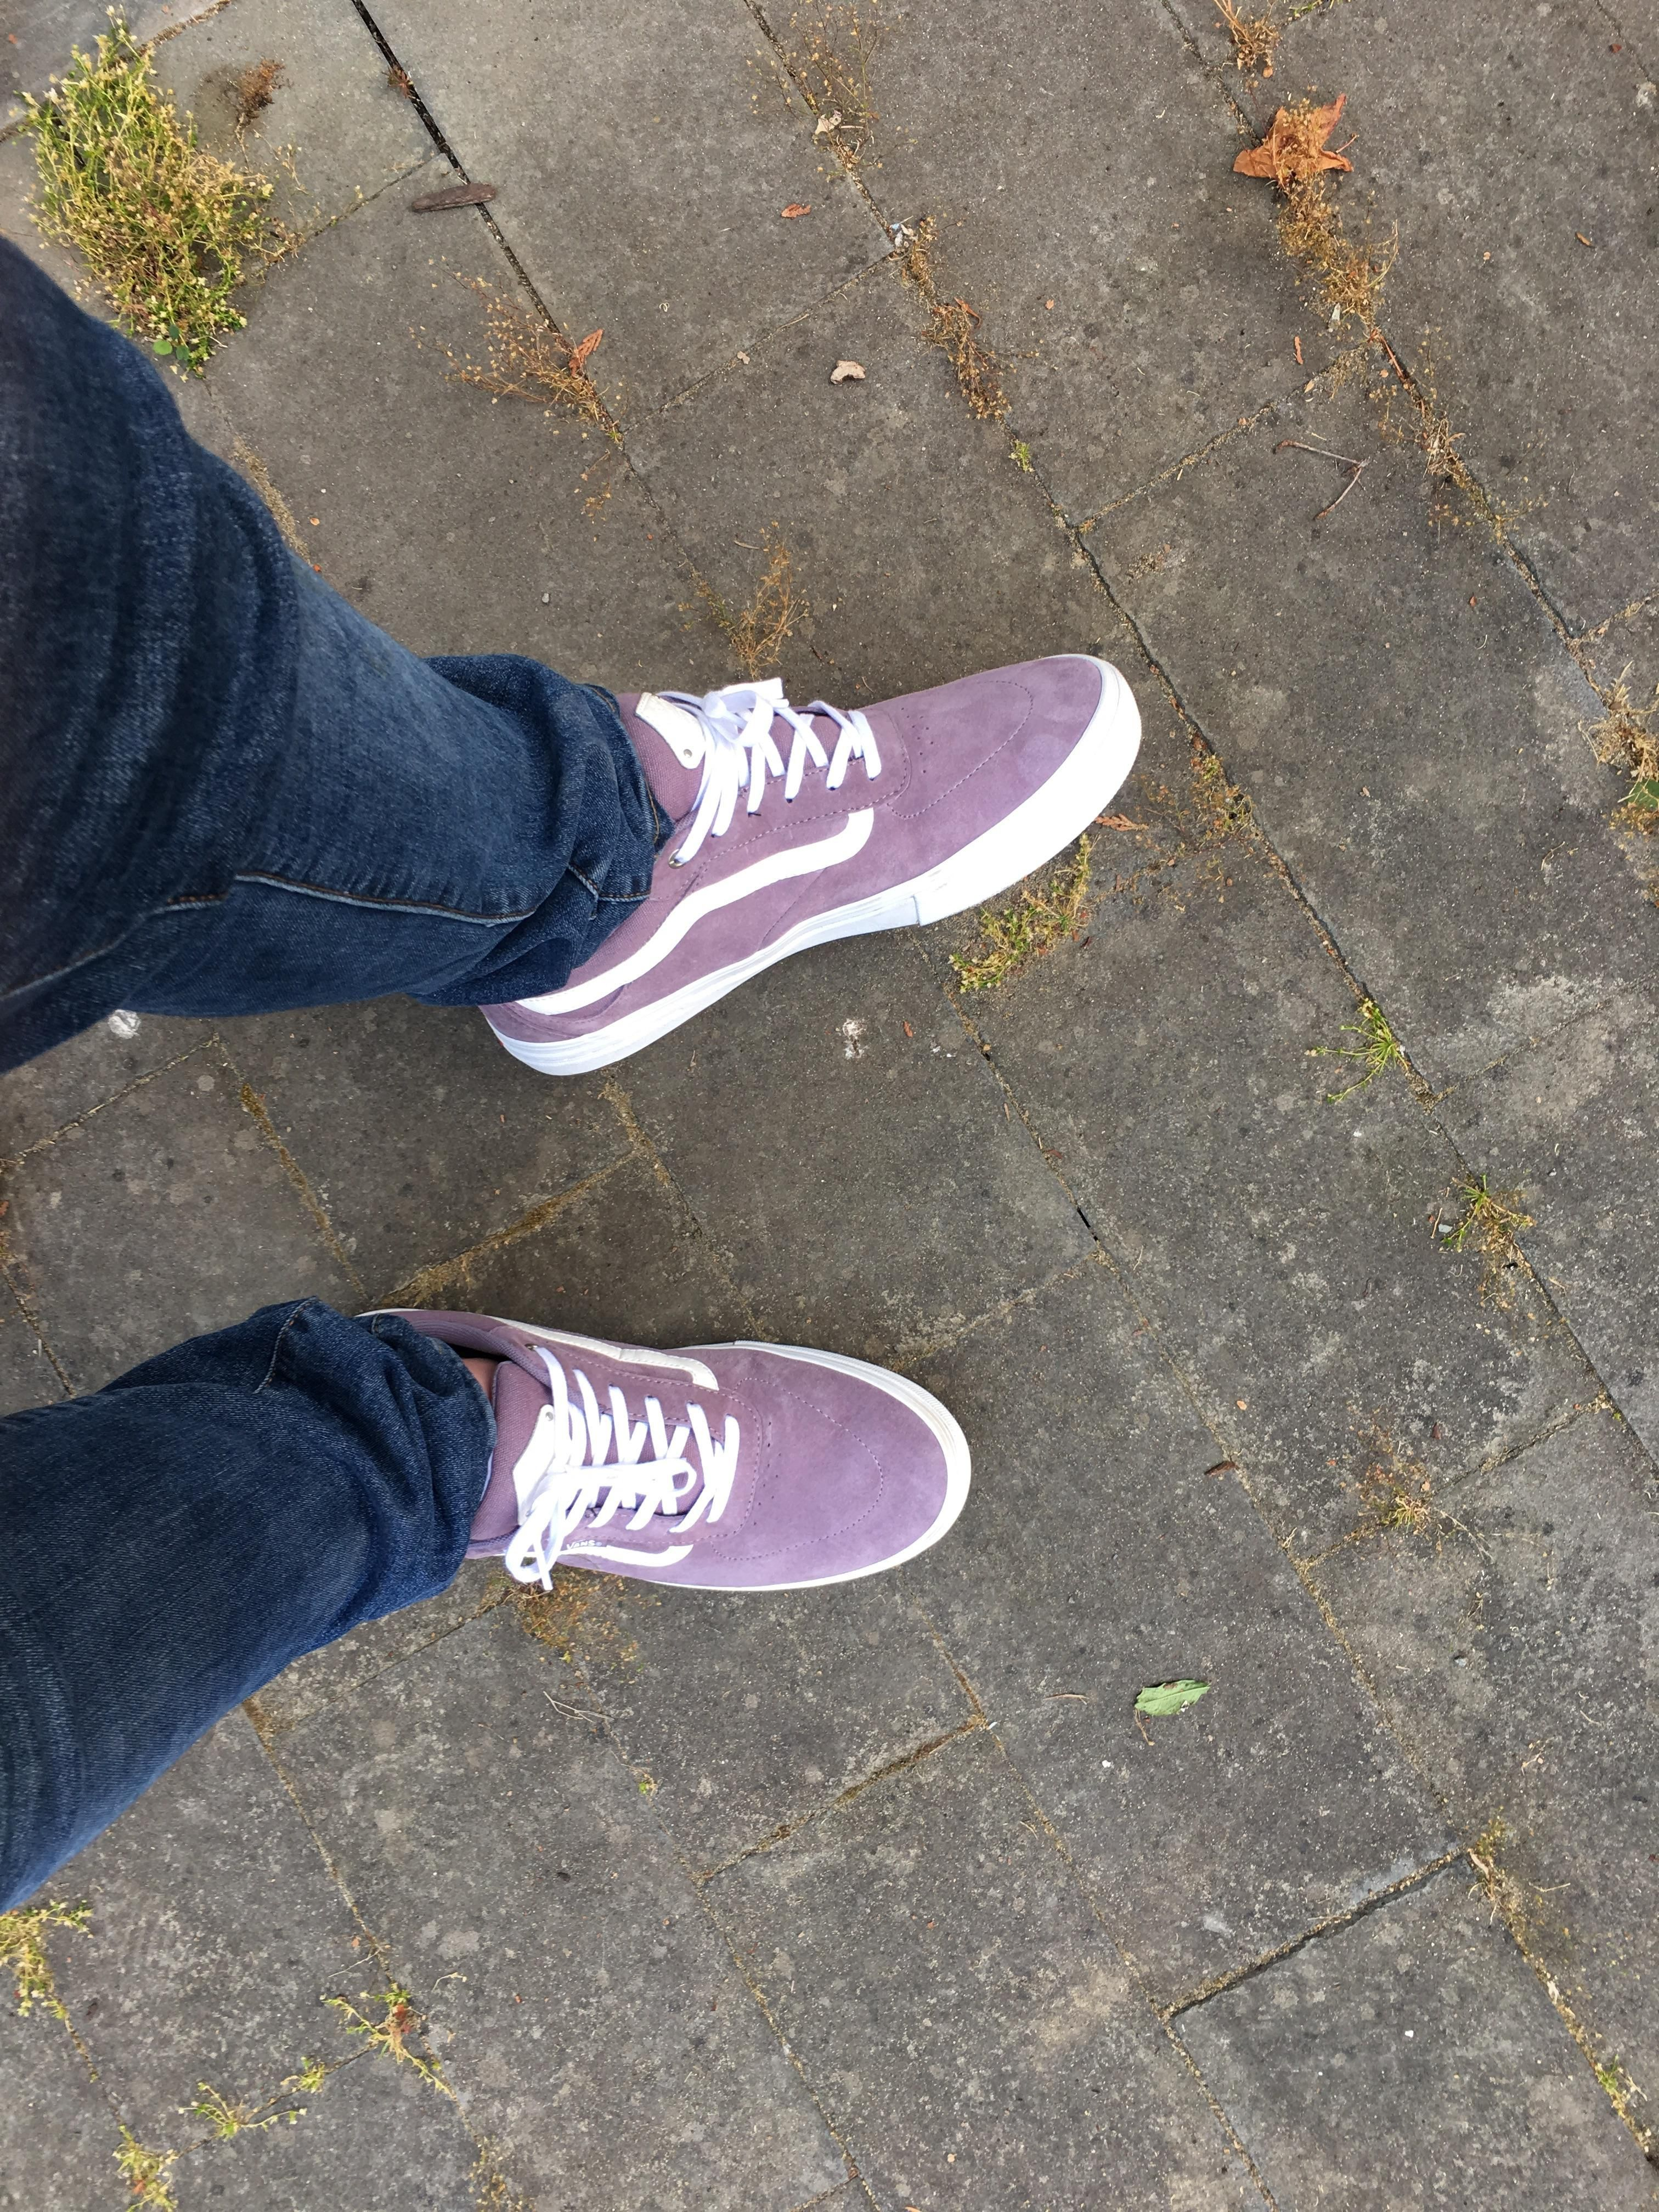 LPU  My new shoes for skating (Vans Kyle Walker Pro Dawn Purple ... 95dd1736d